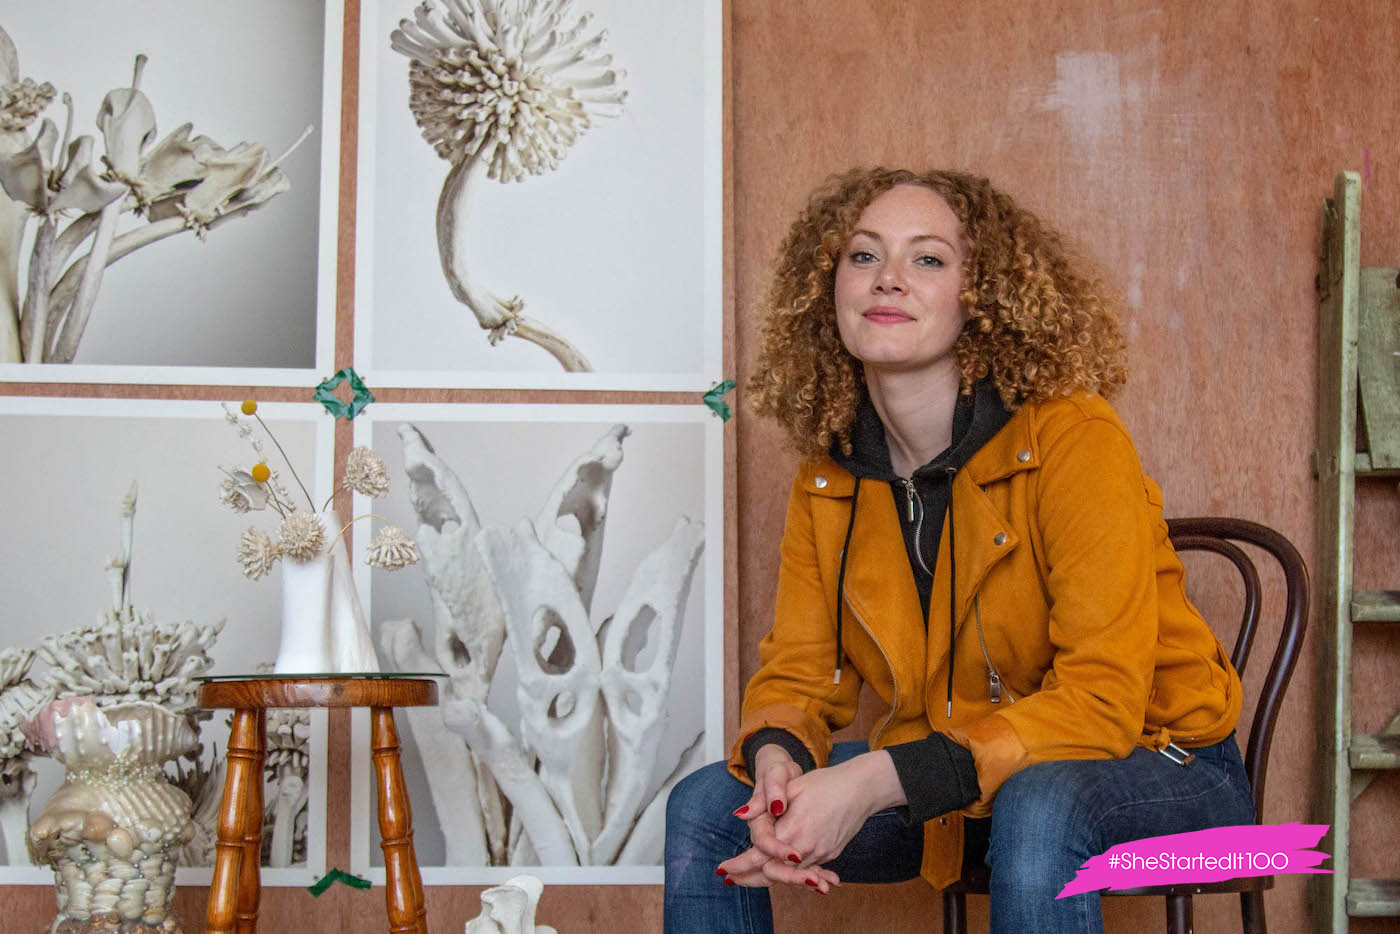 Women to Watch in the Arts, top Women to Watch in the Arts, Women in the Arts